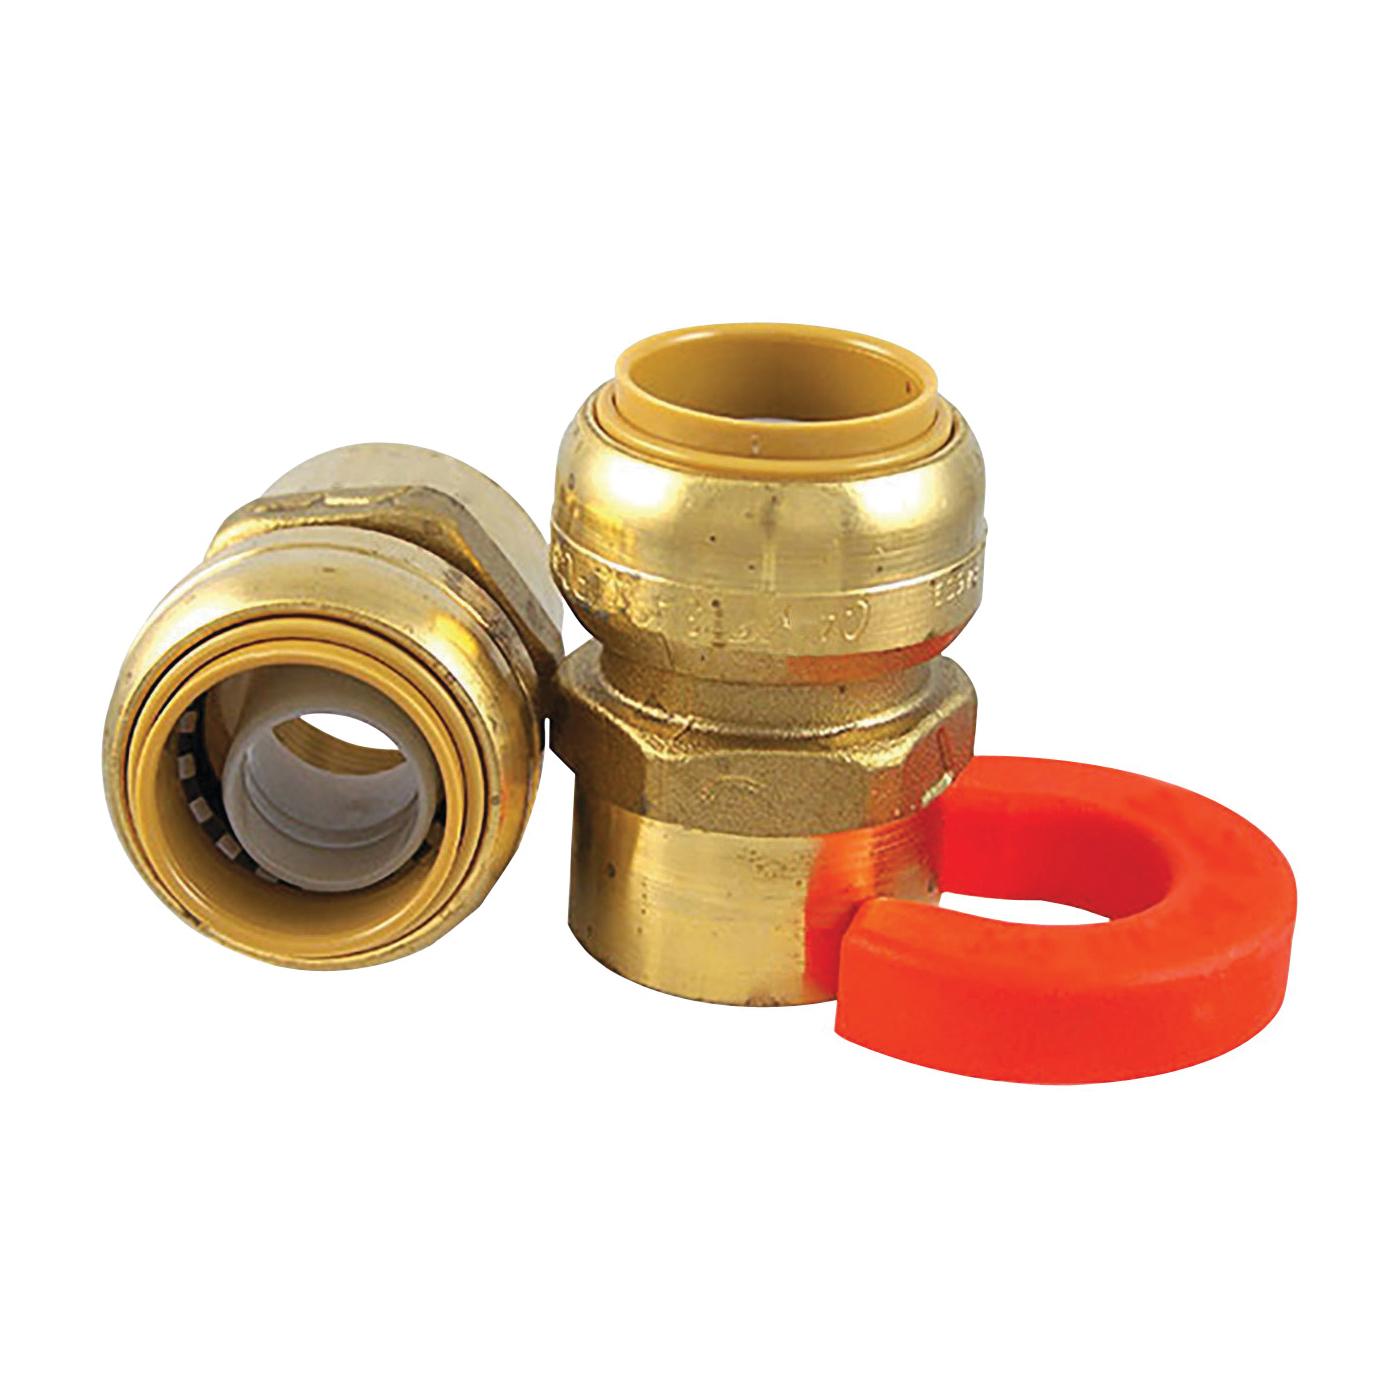 Picture of SharkBite 22441LF Water Heater Installation Kit, Push-Fit, Brass